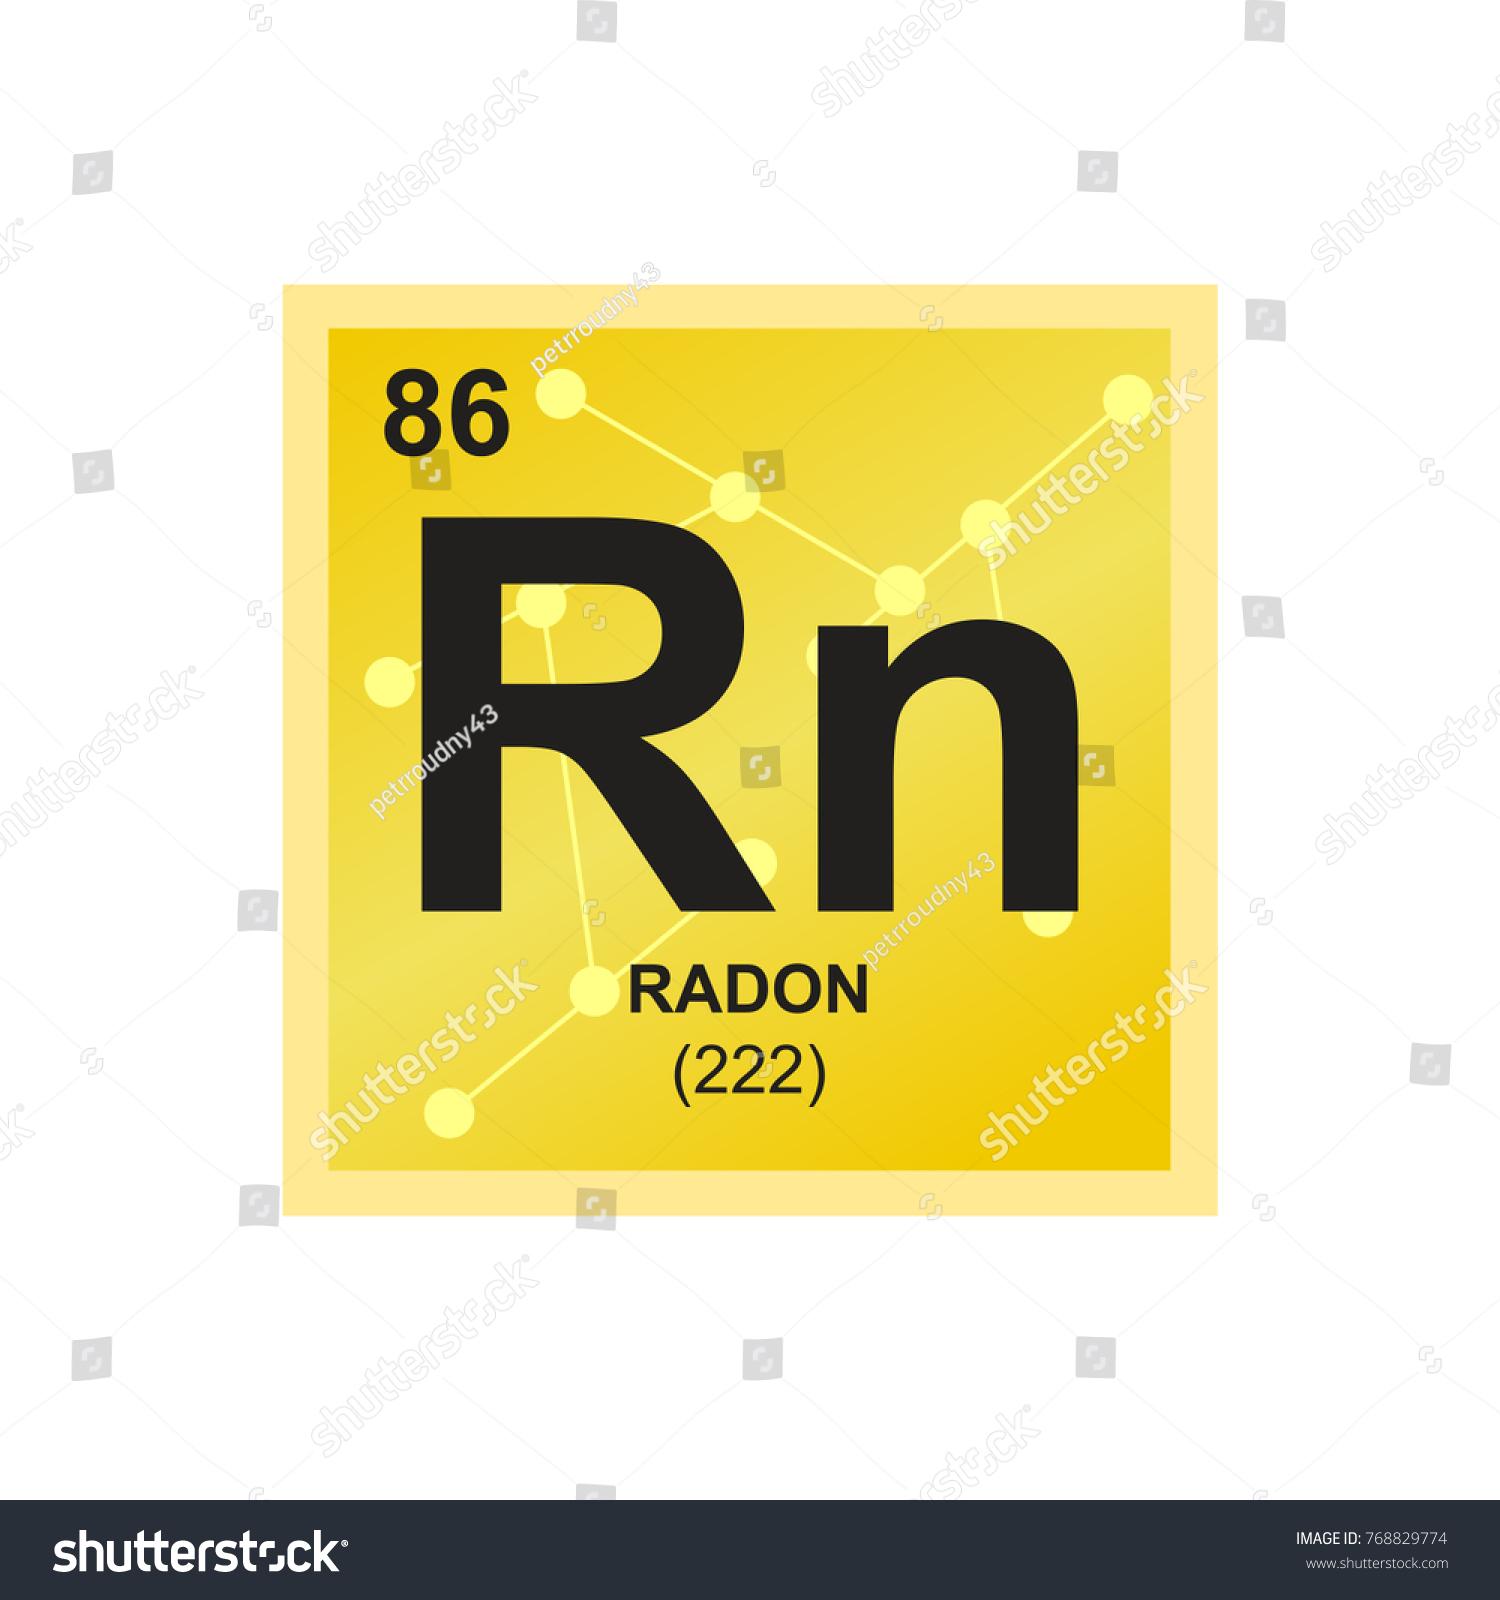 Radon symbol periodic table gallery periodic table images radon symbol periodic table images periodic table images radon symbol periodic table choice image periodic table gamestrikefo Images